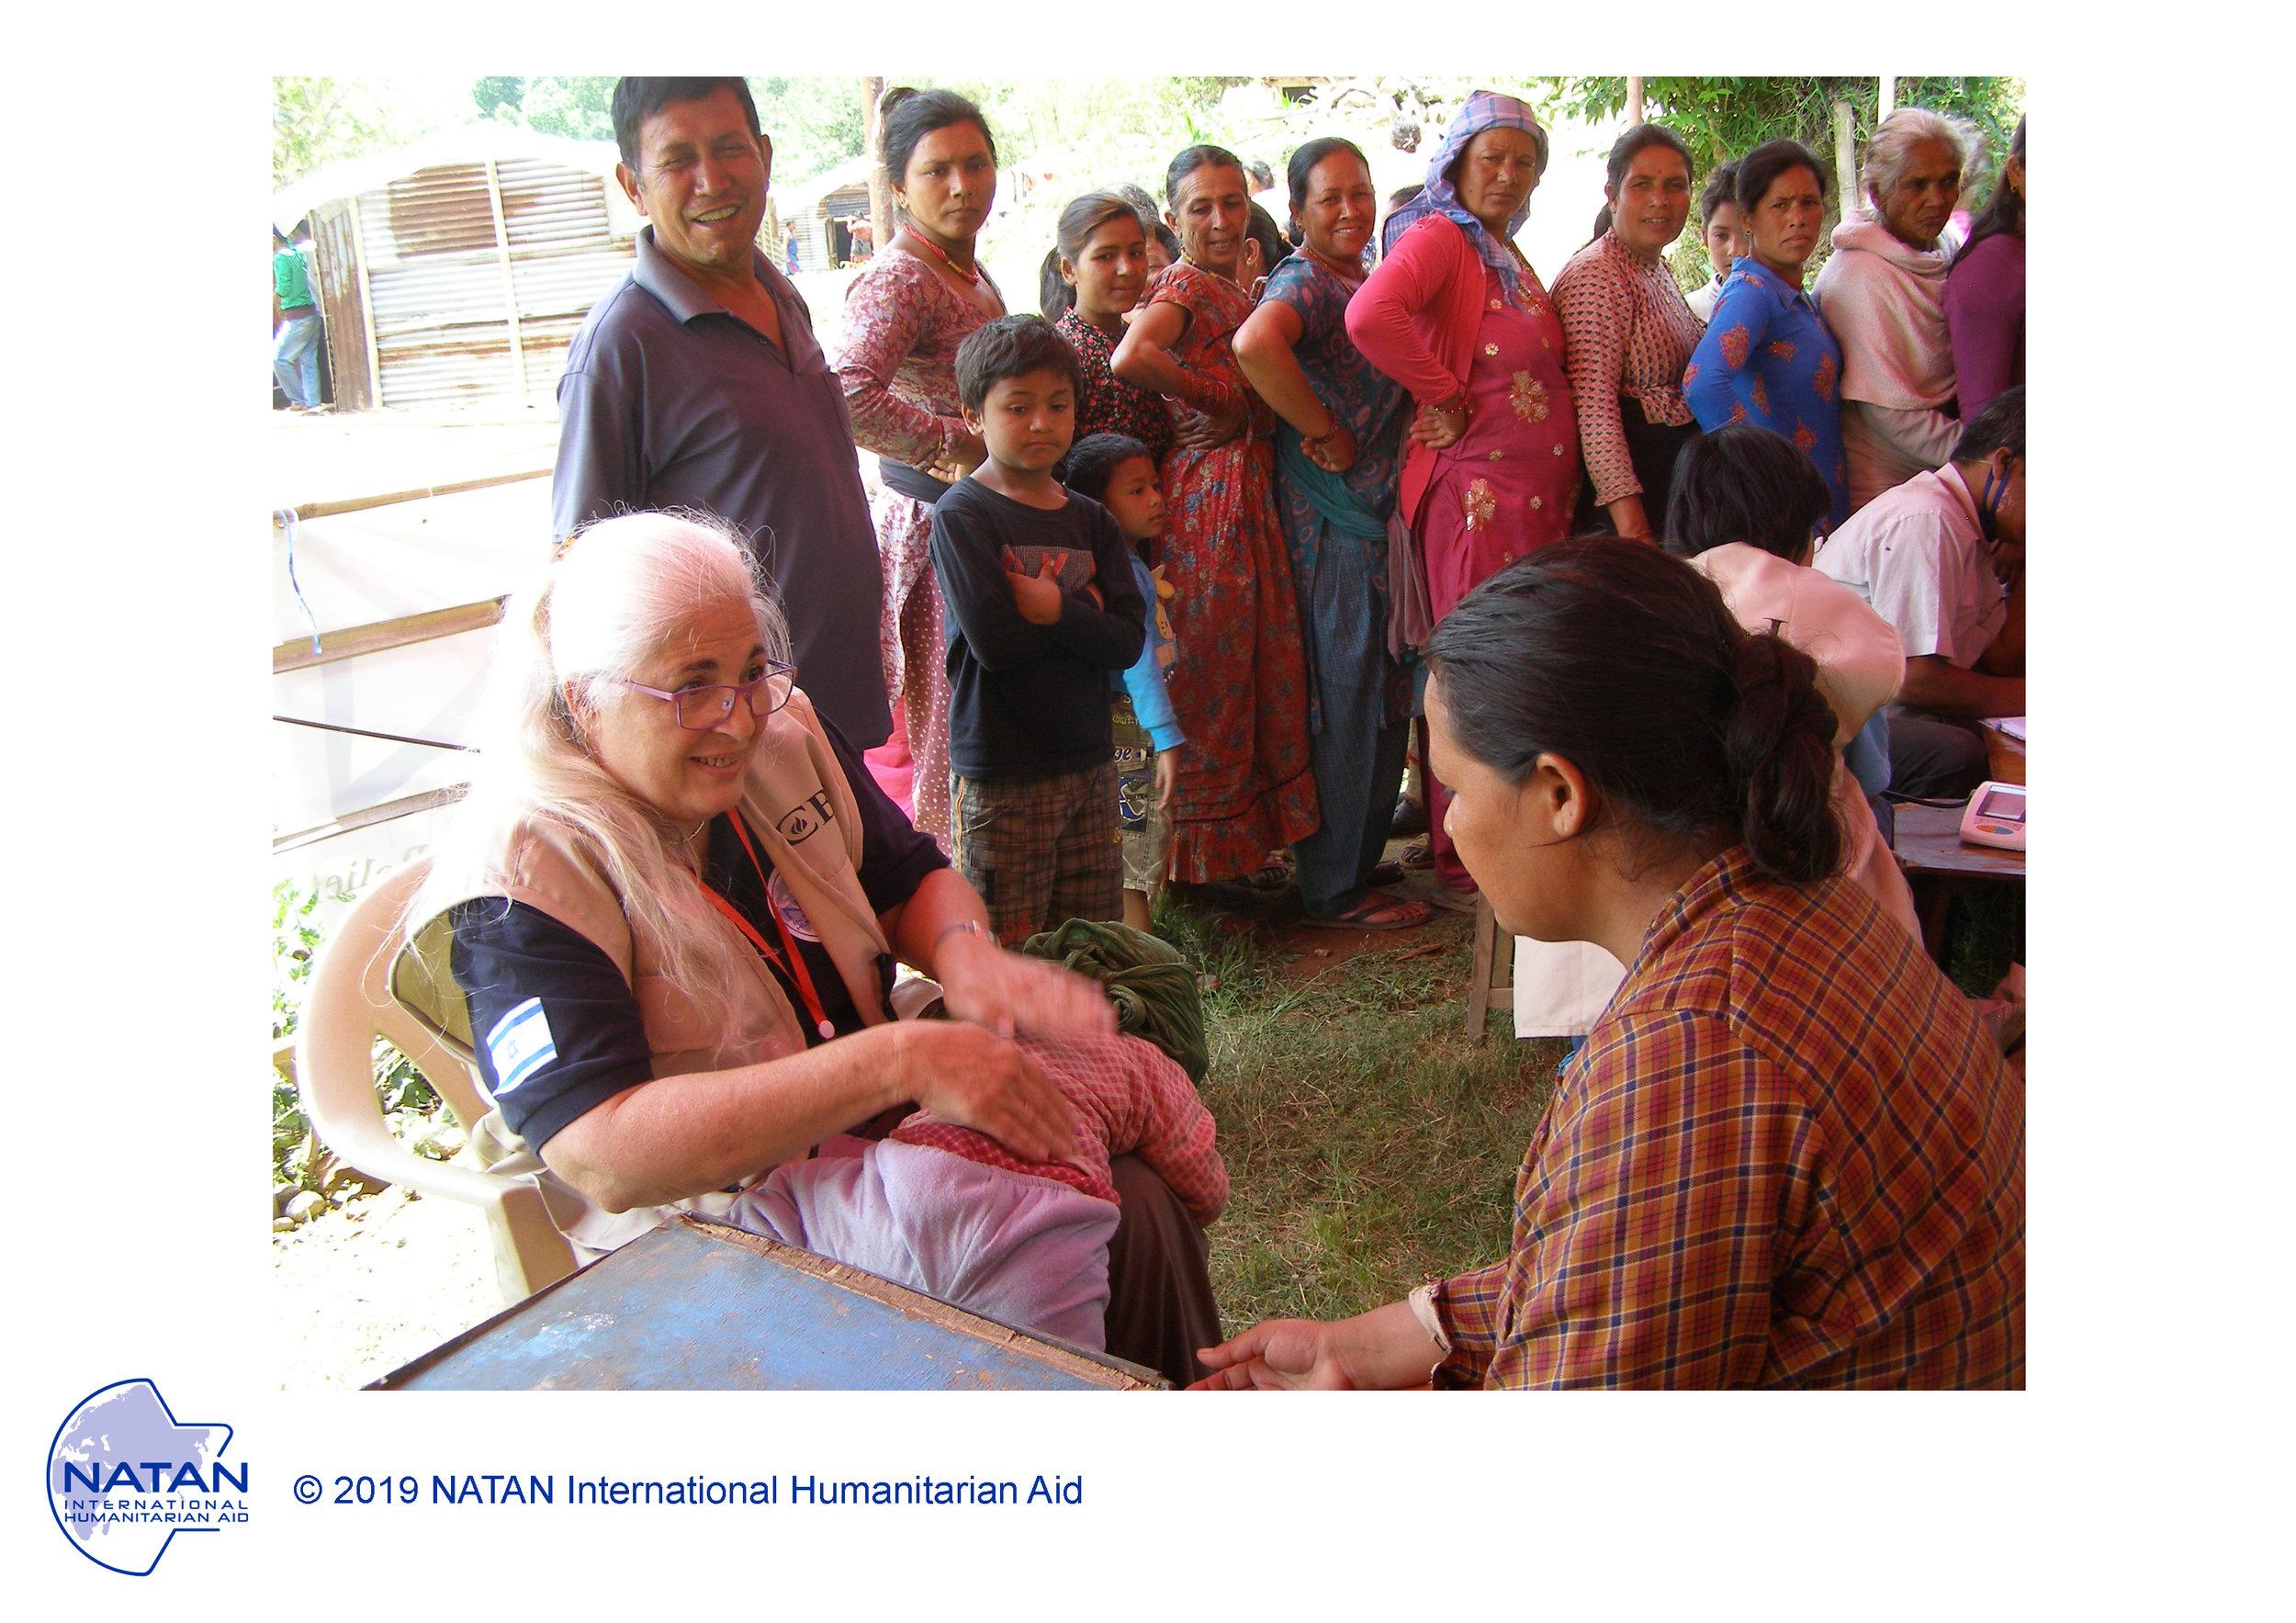 nepal 2015 - natan nurse performing assessments of earthquake survivors in nepal